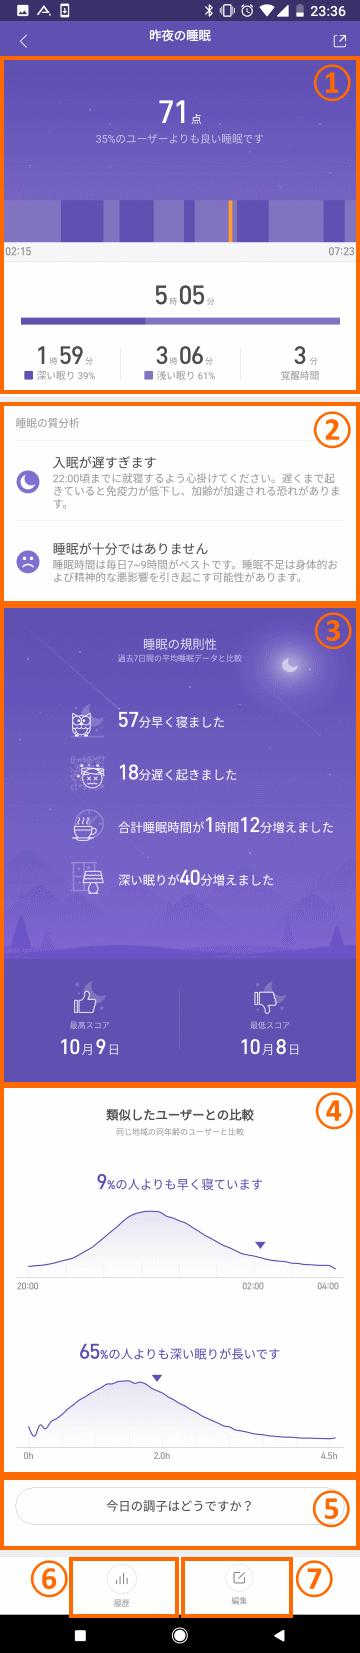 Mi Fitアプリ: 睡眠データの詳細表示